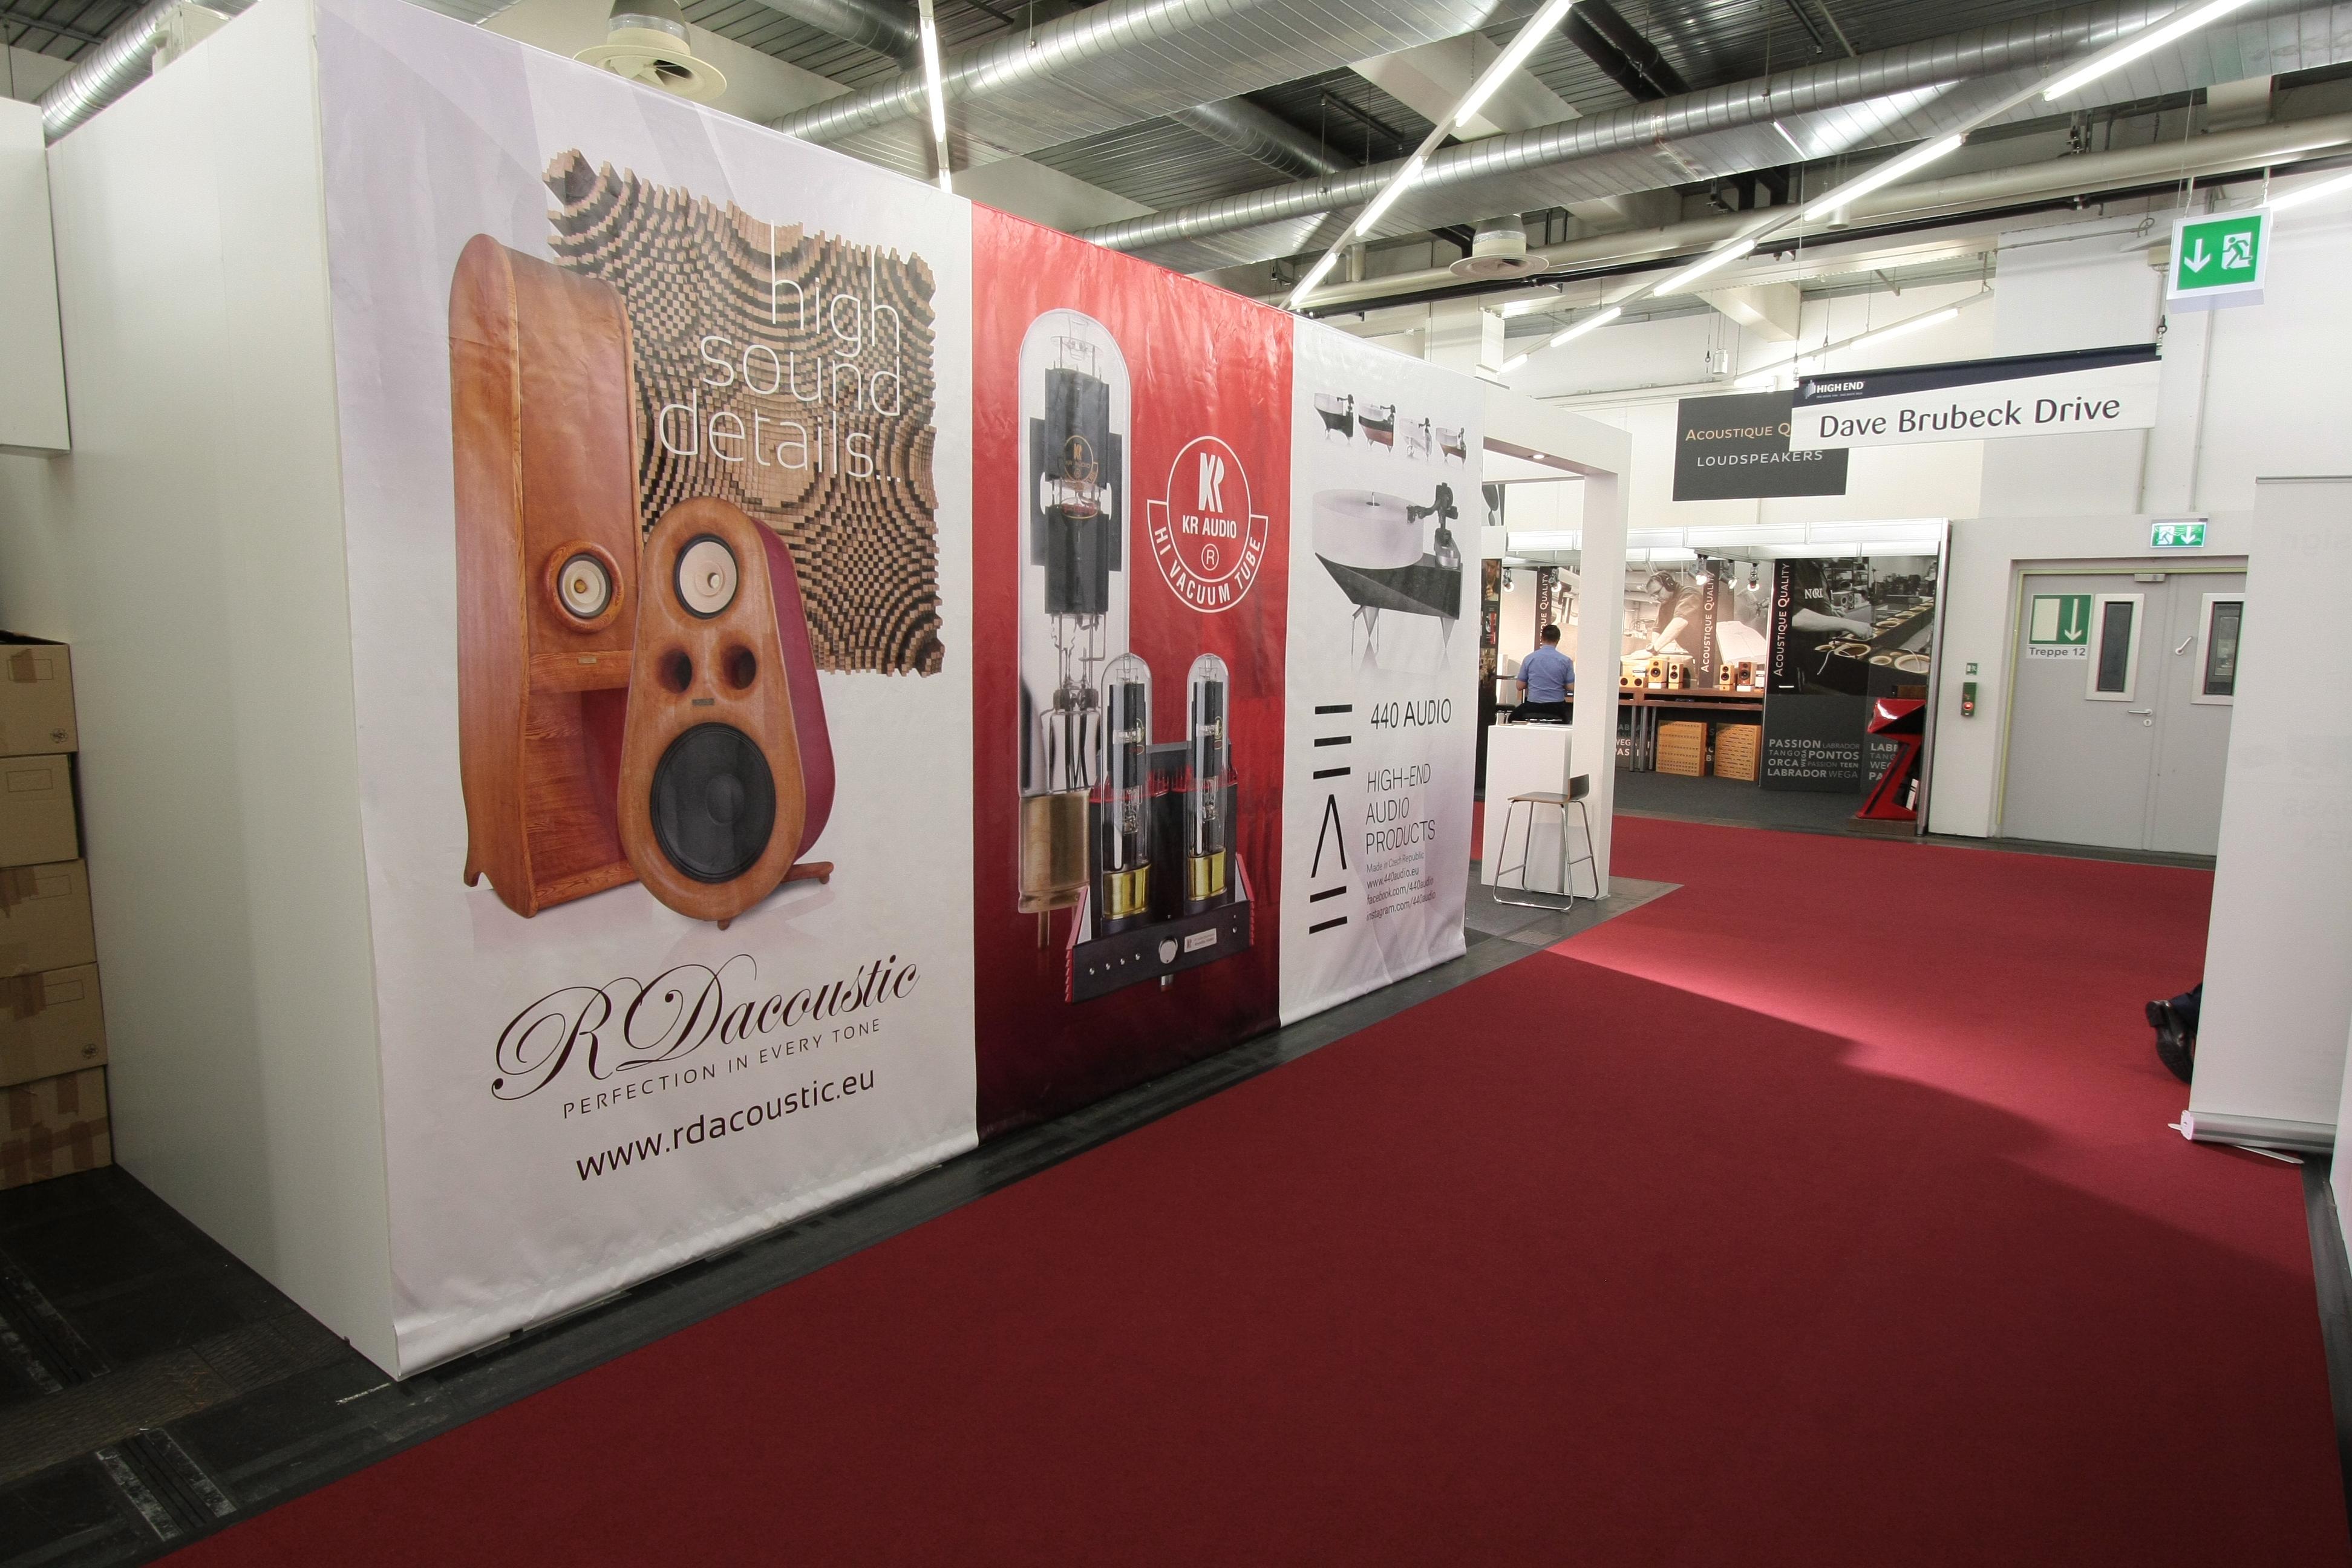 High End speakers Evolution, Euphoria for true HIFI stereo, KR audio, Kronzilla, acoustic Diffuser, HIFI, High End home audio